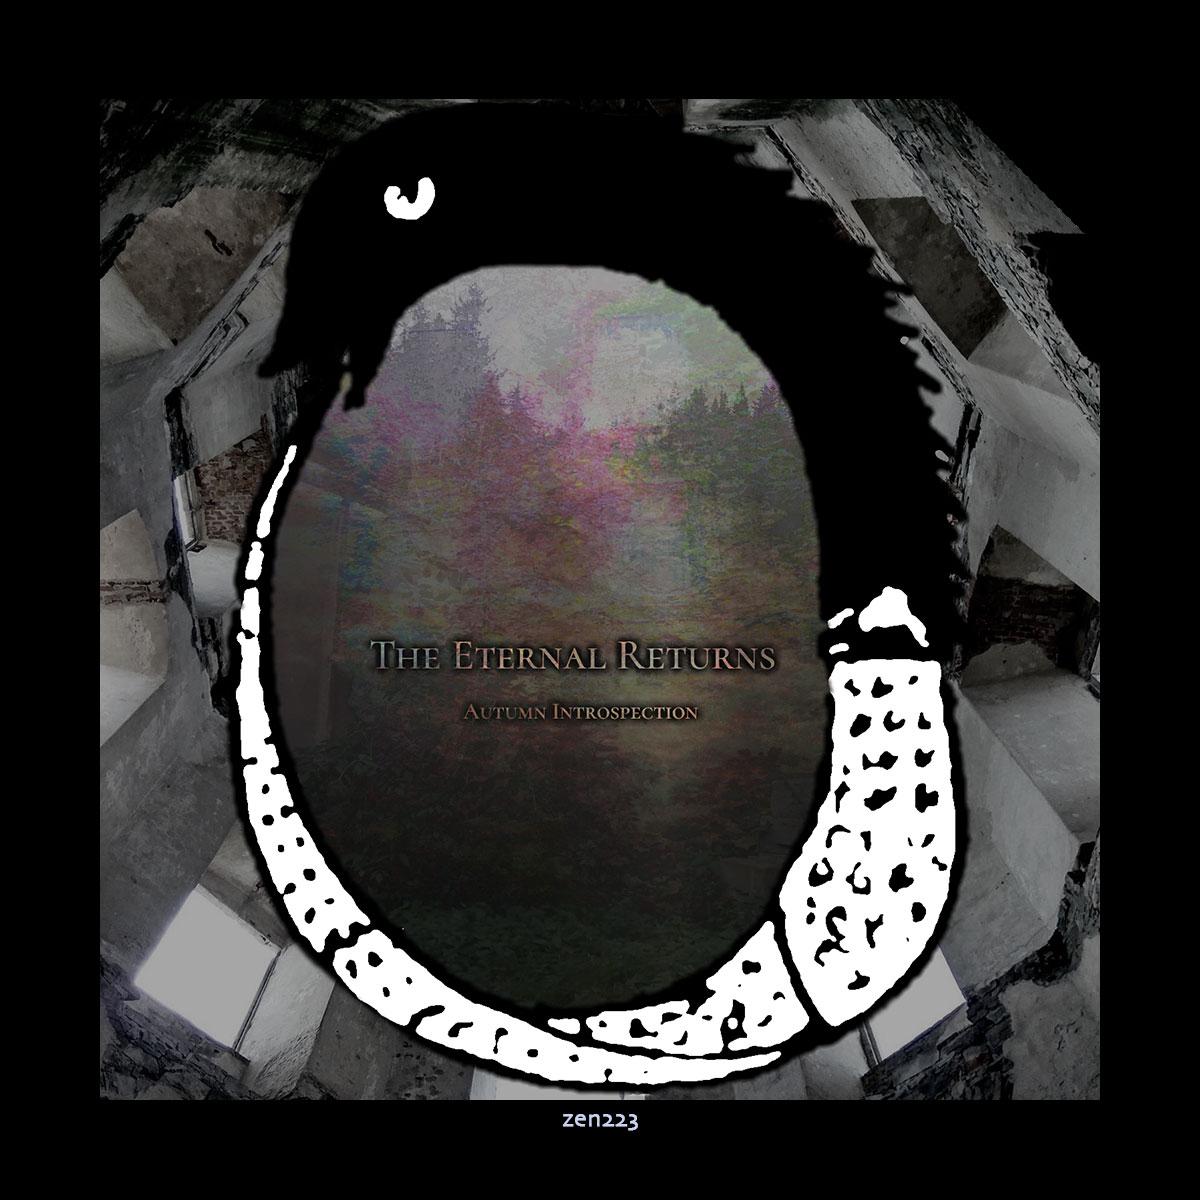 The Eternal Returns – Autumn Introspection